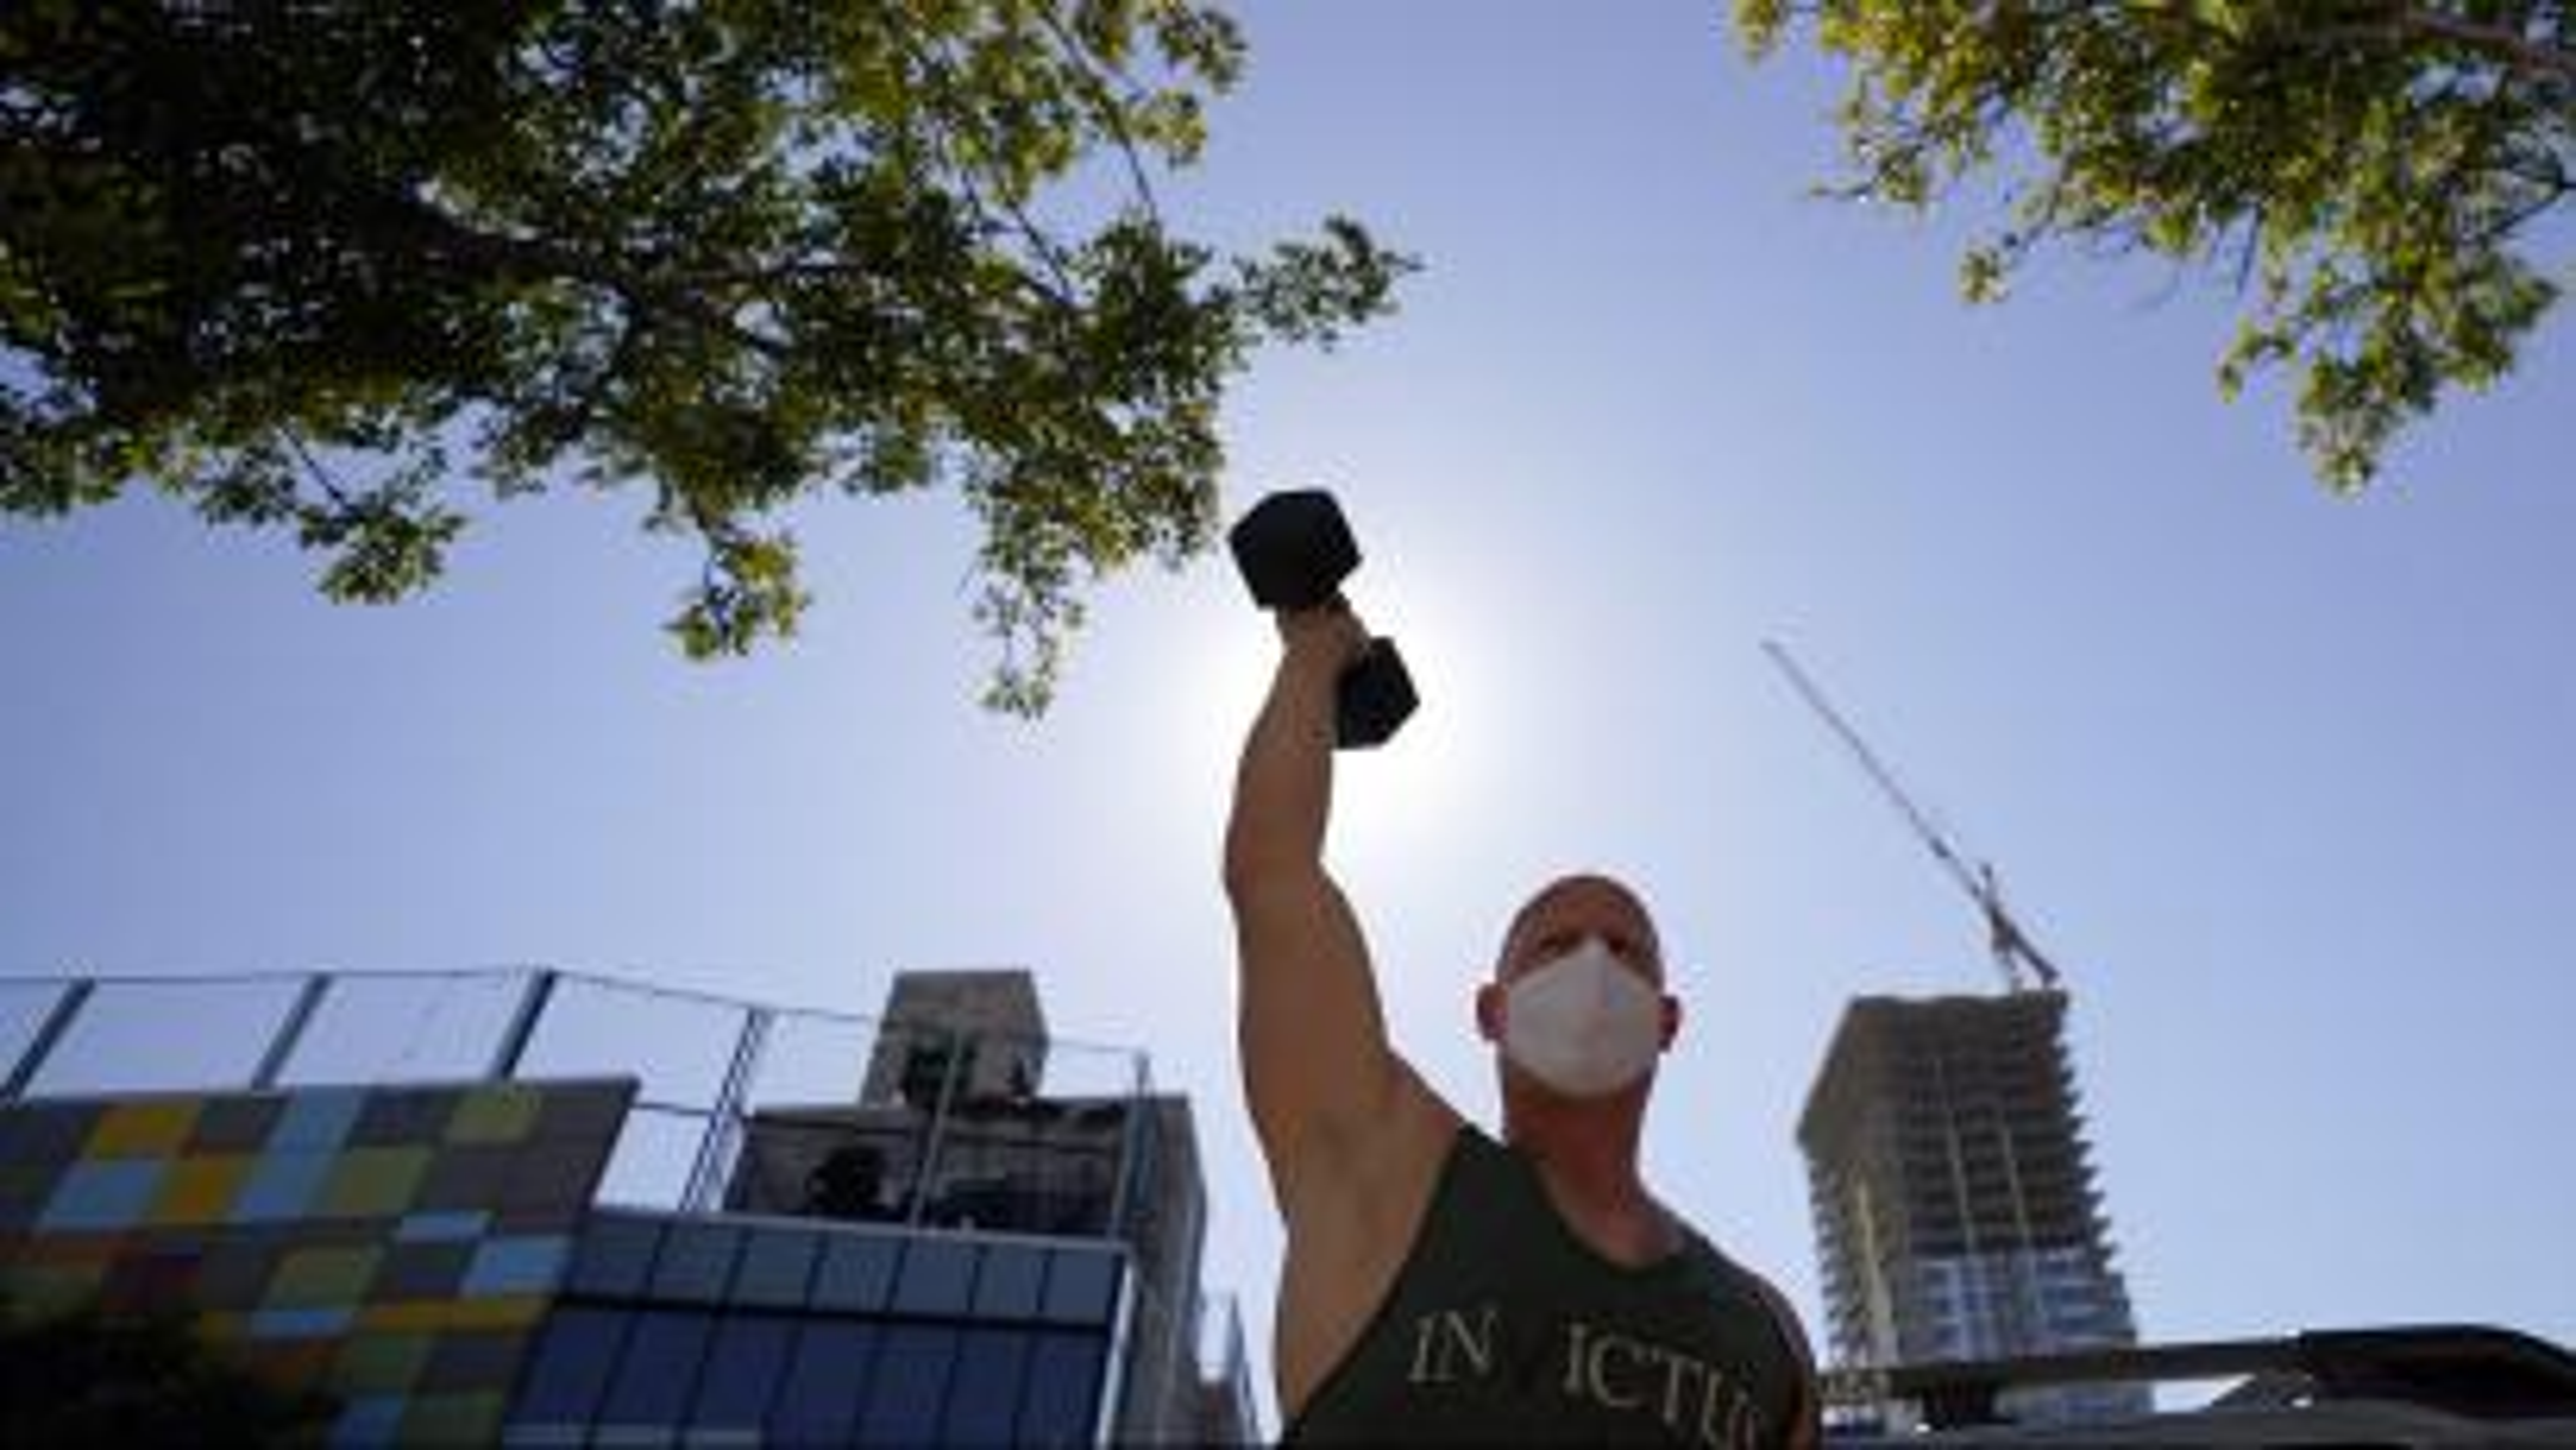 A man lifts weights outdoors